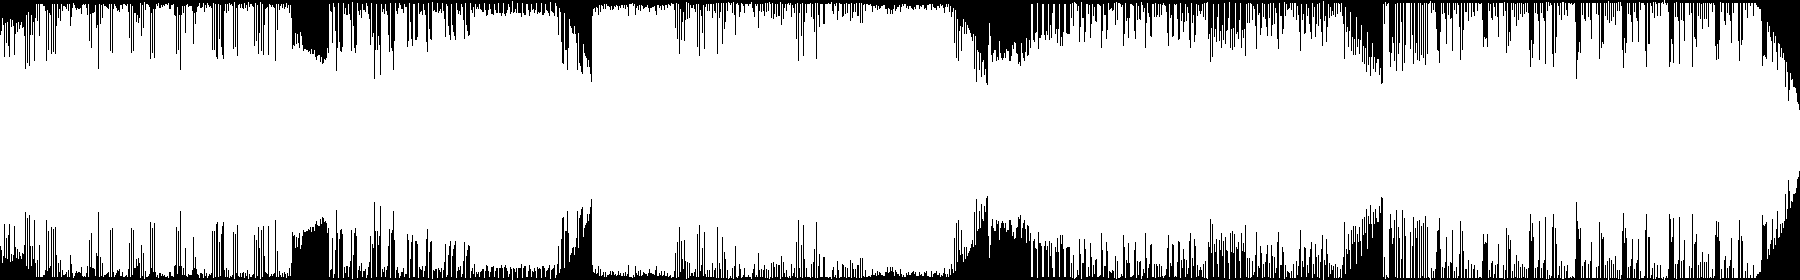 Bustla audio waveform